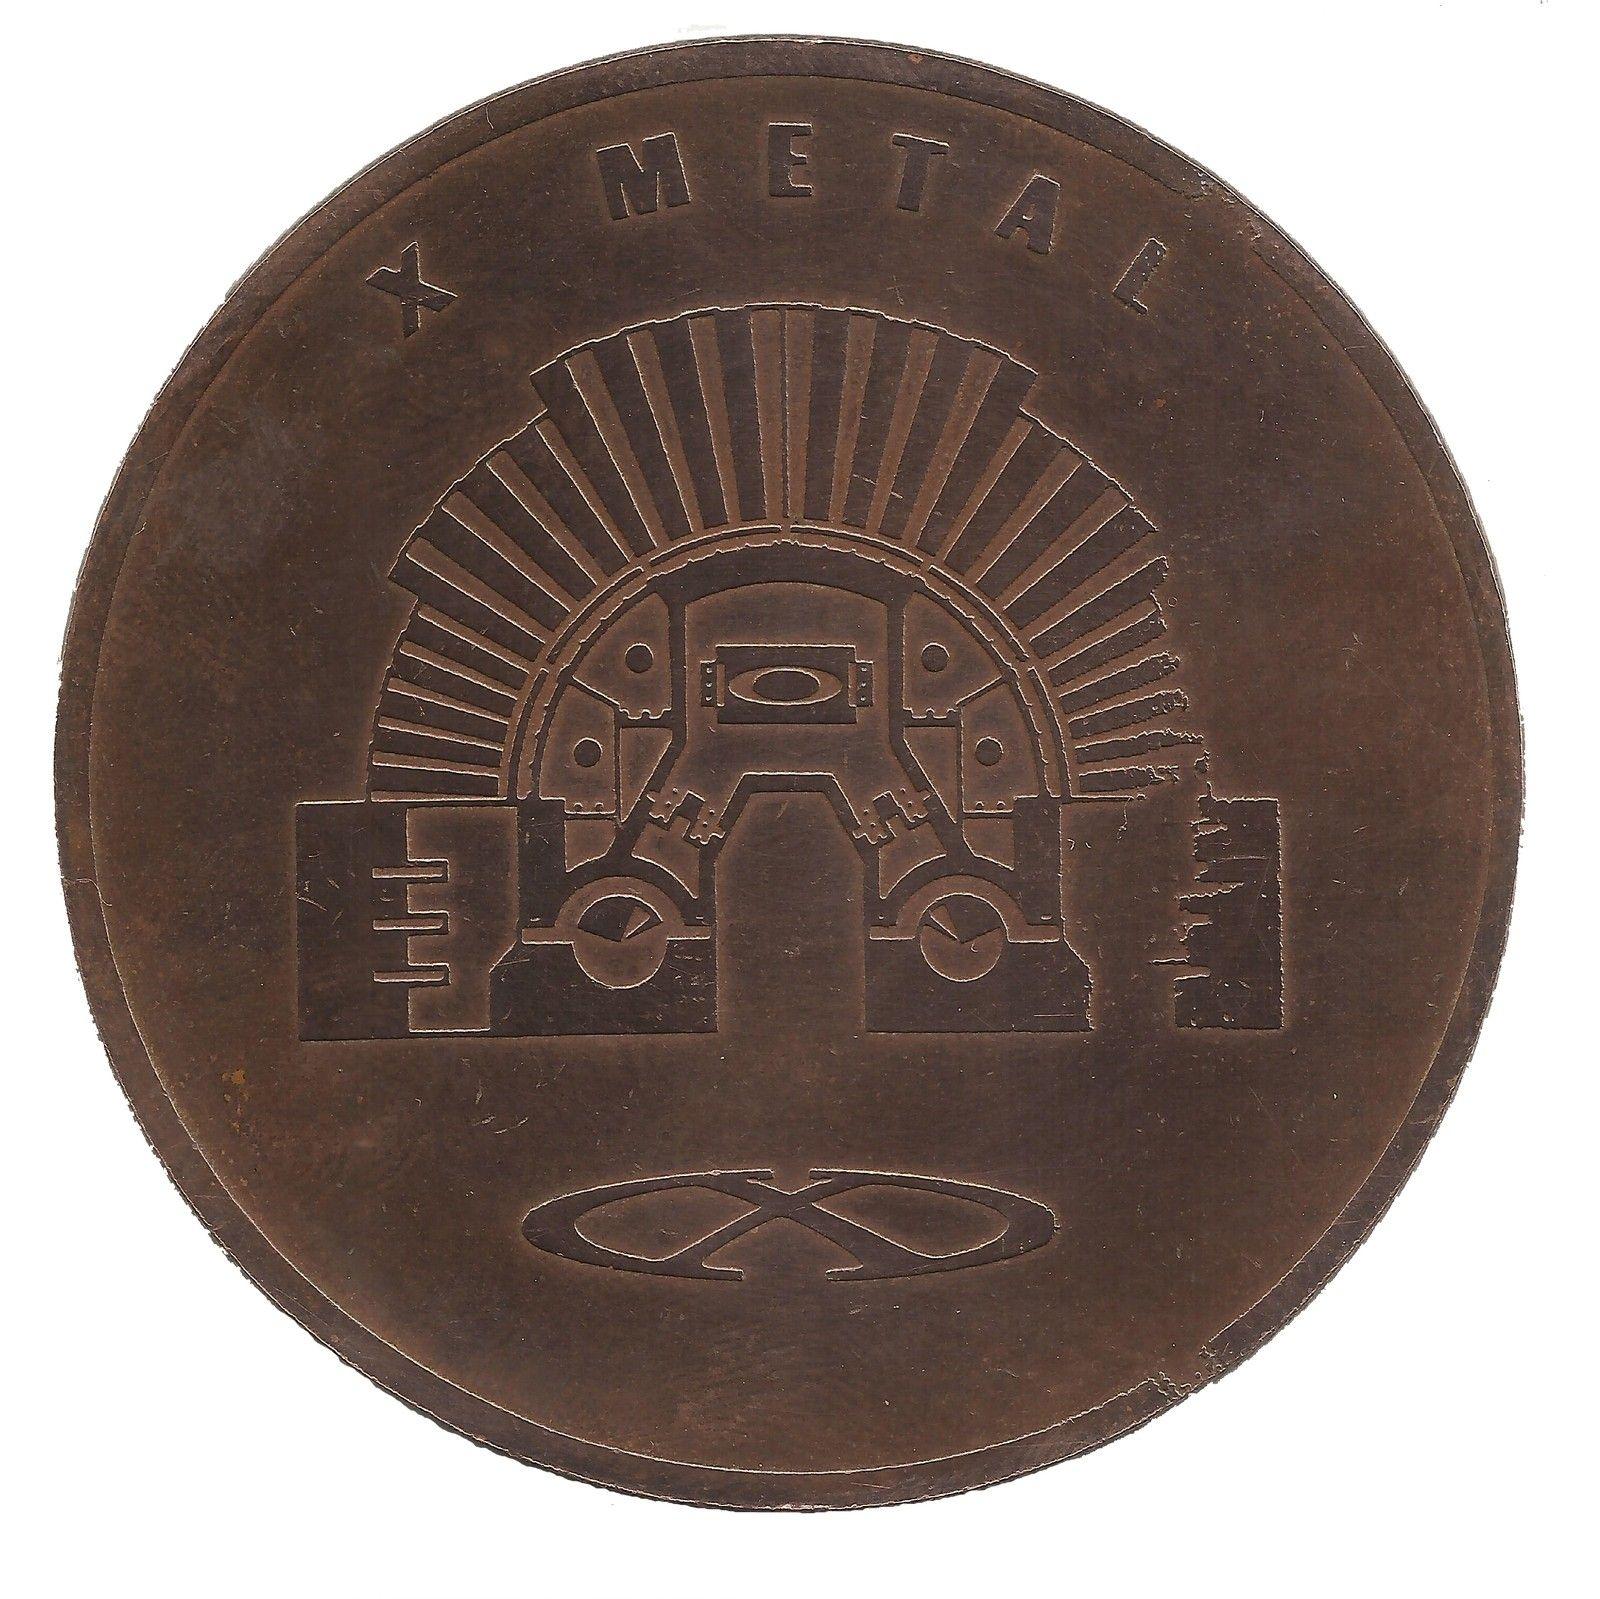 Oakley Penny Copper Coin Specimen - MAD SCIENCE ERA 2001 - Mad Science Back.jpg